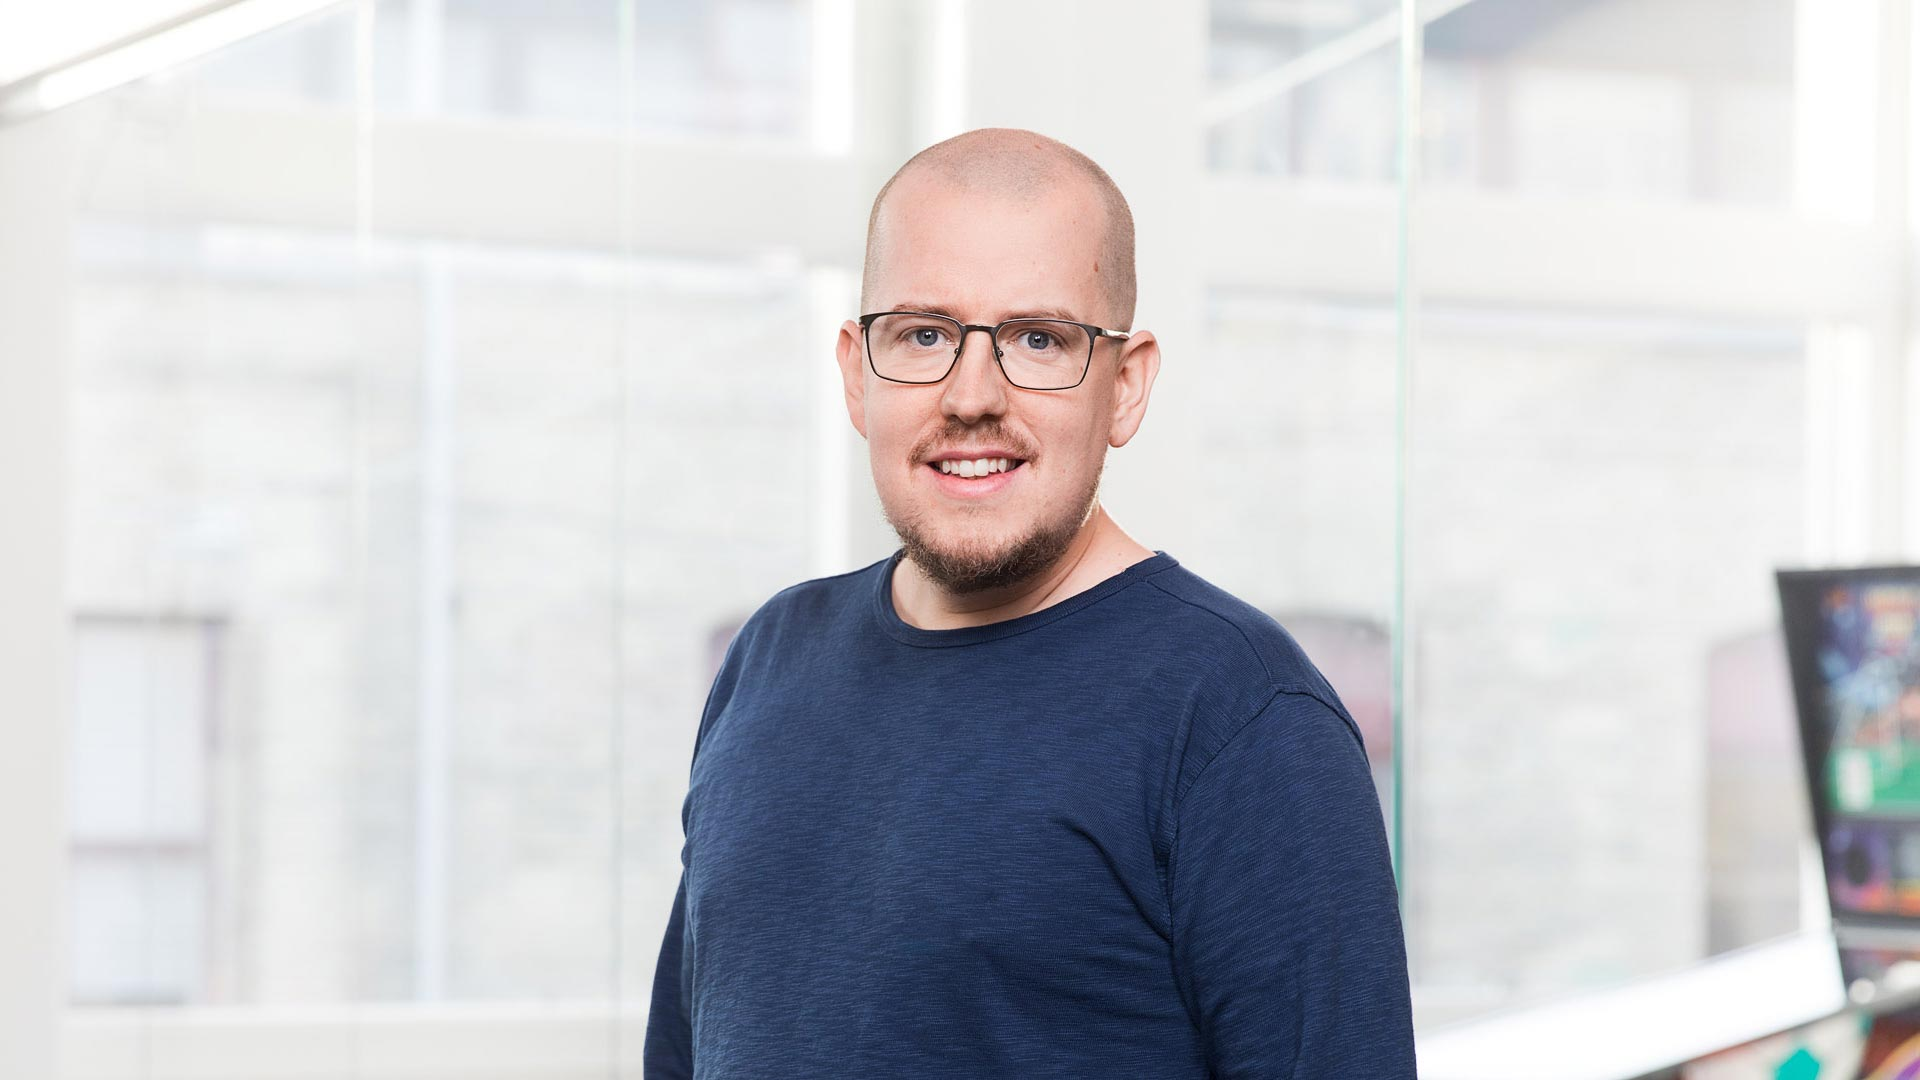 Kristoffer Skarström